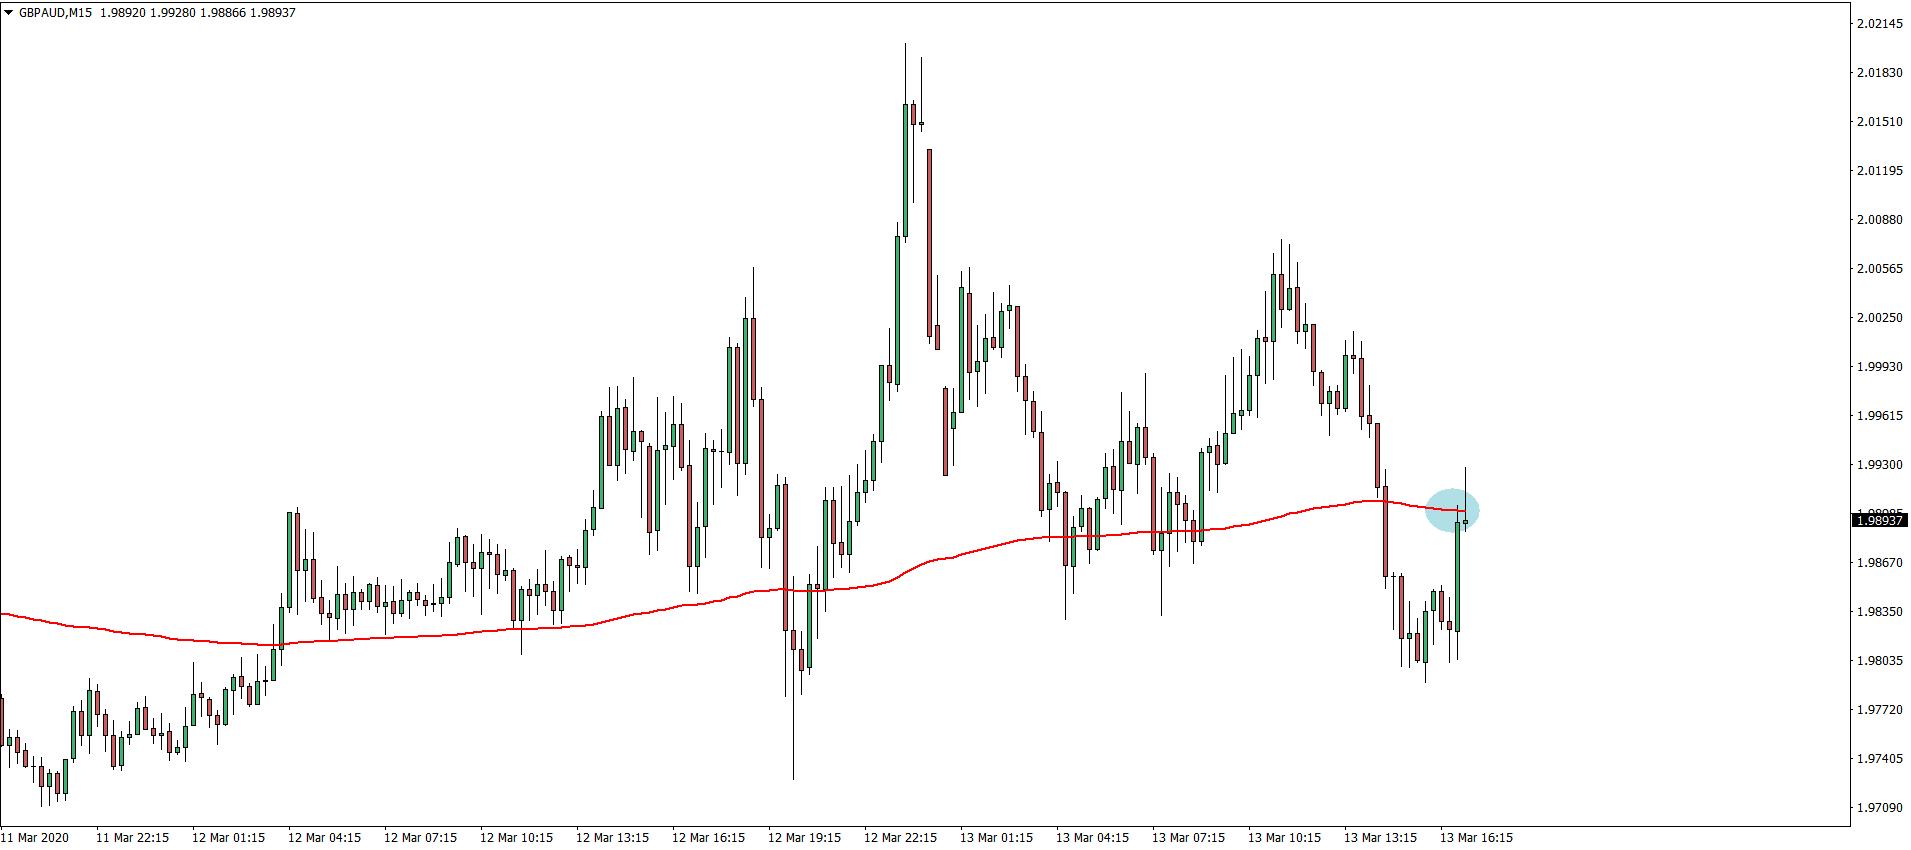 gbpaud_15m_chart